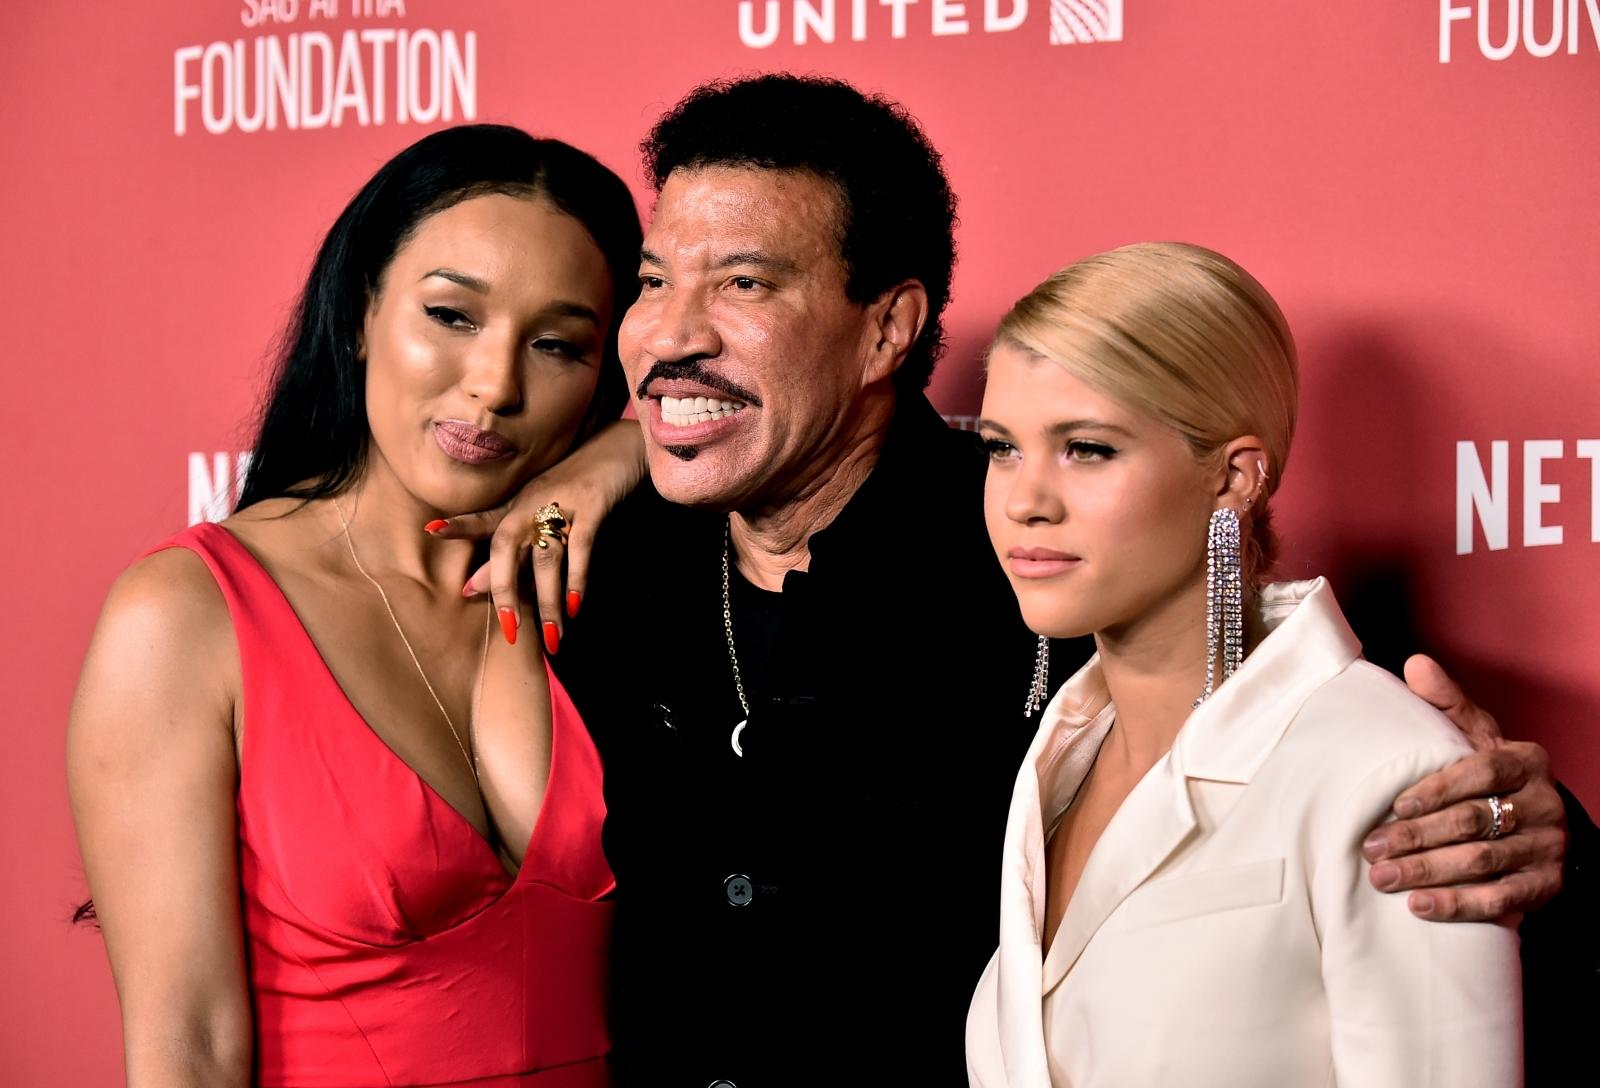 Lionel Richie and Sofia Richie